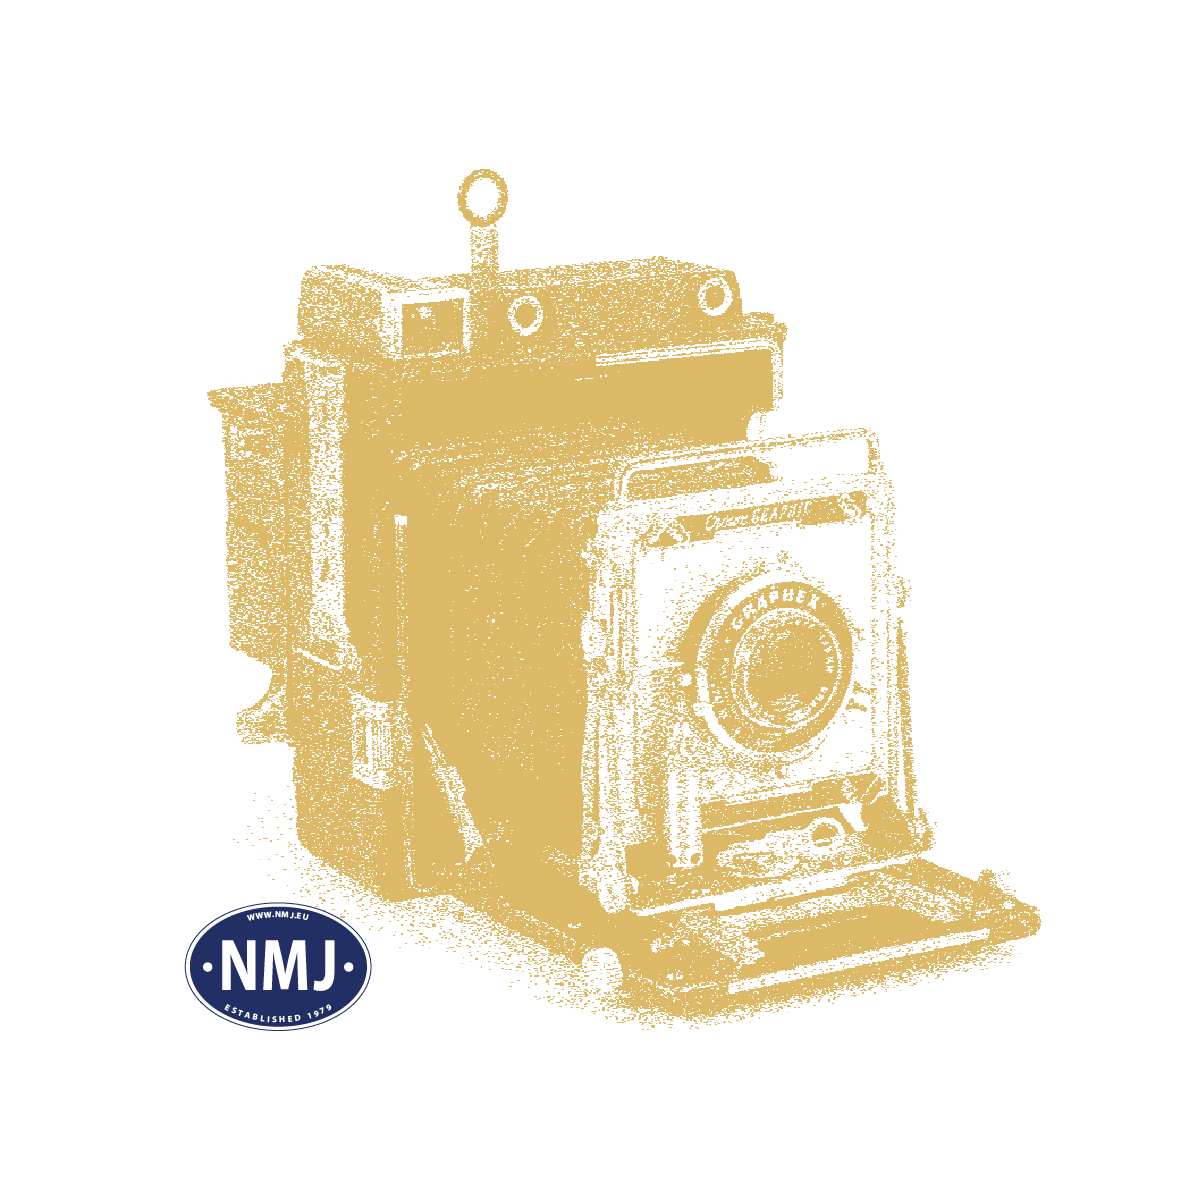 NMJT507.114 - NMJ Topline CargoNet Lgns 42 76 443 2415-9, 2 24`NOR LINES container